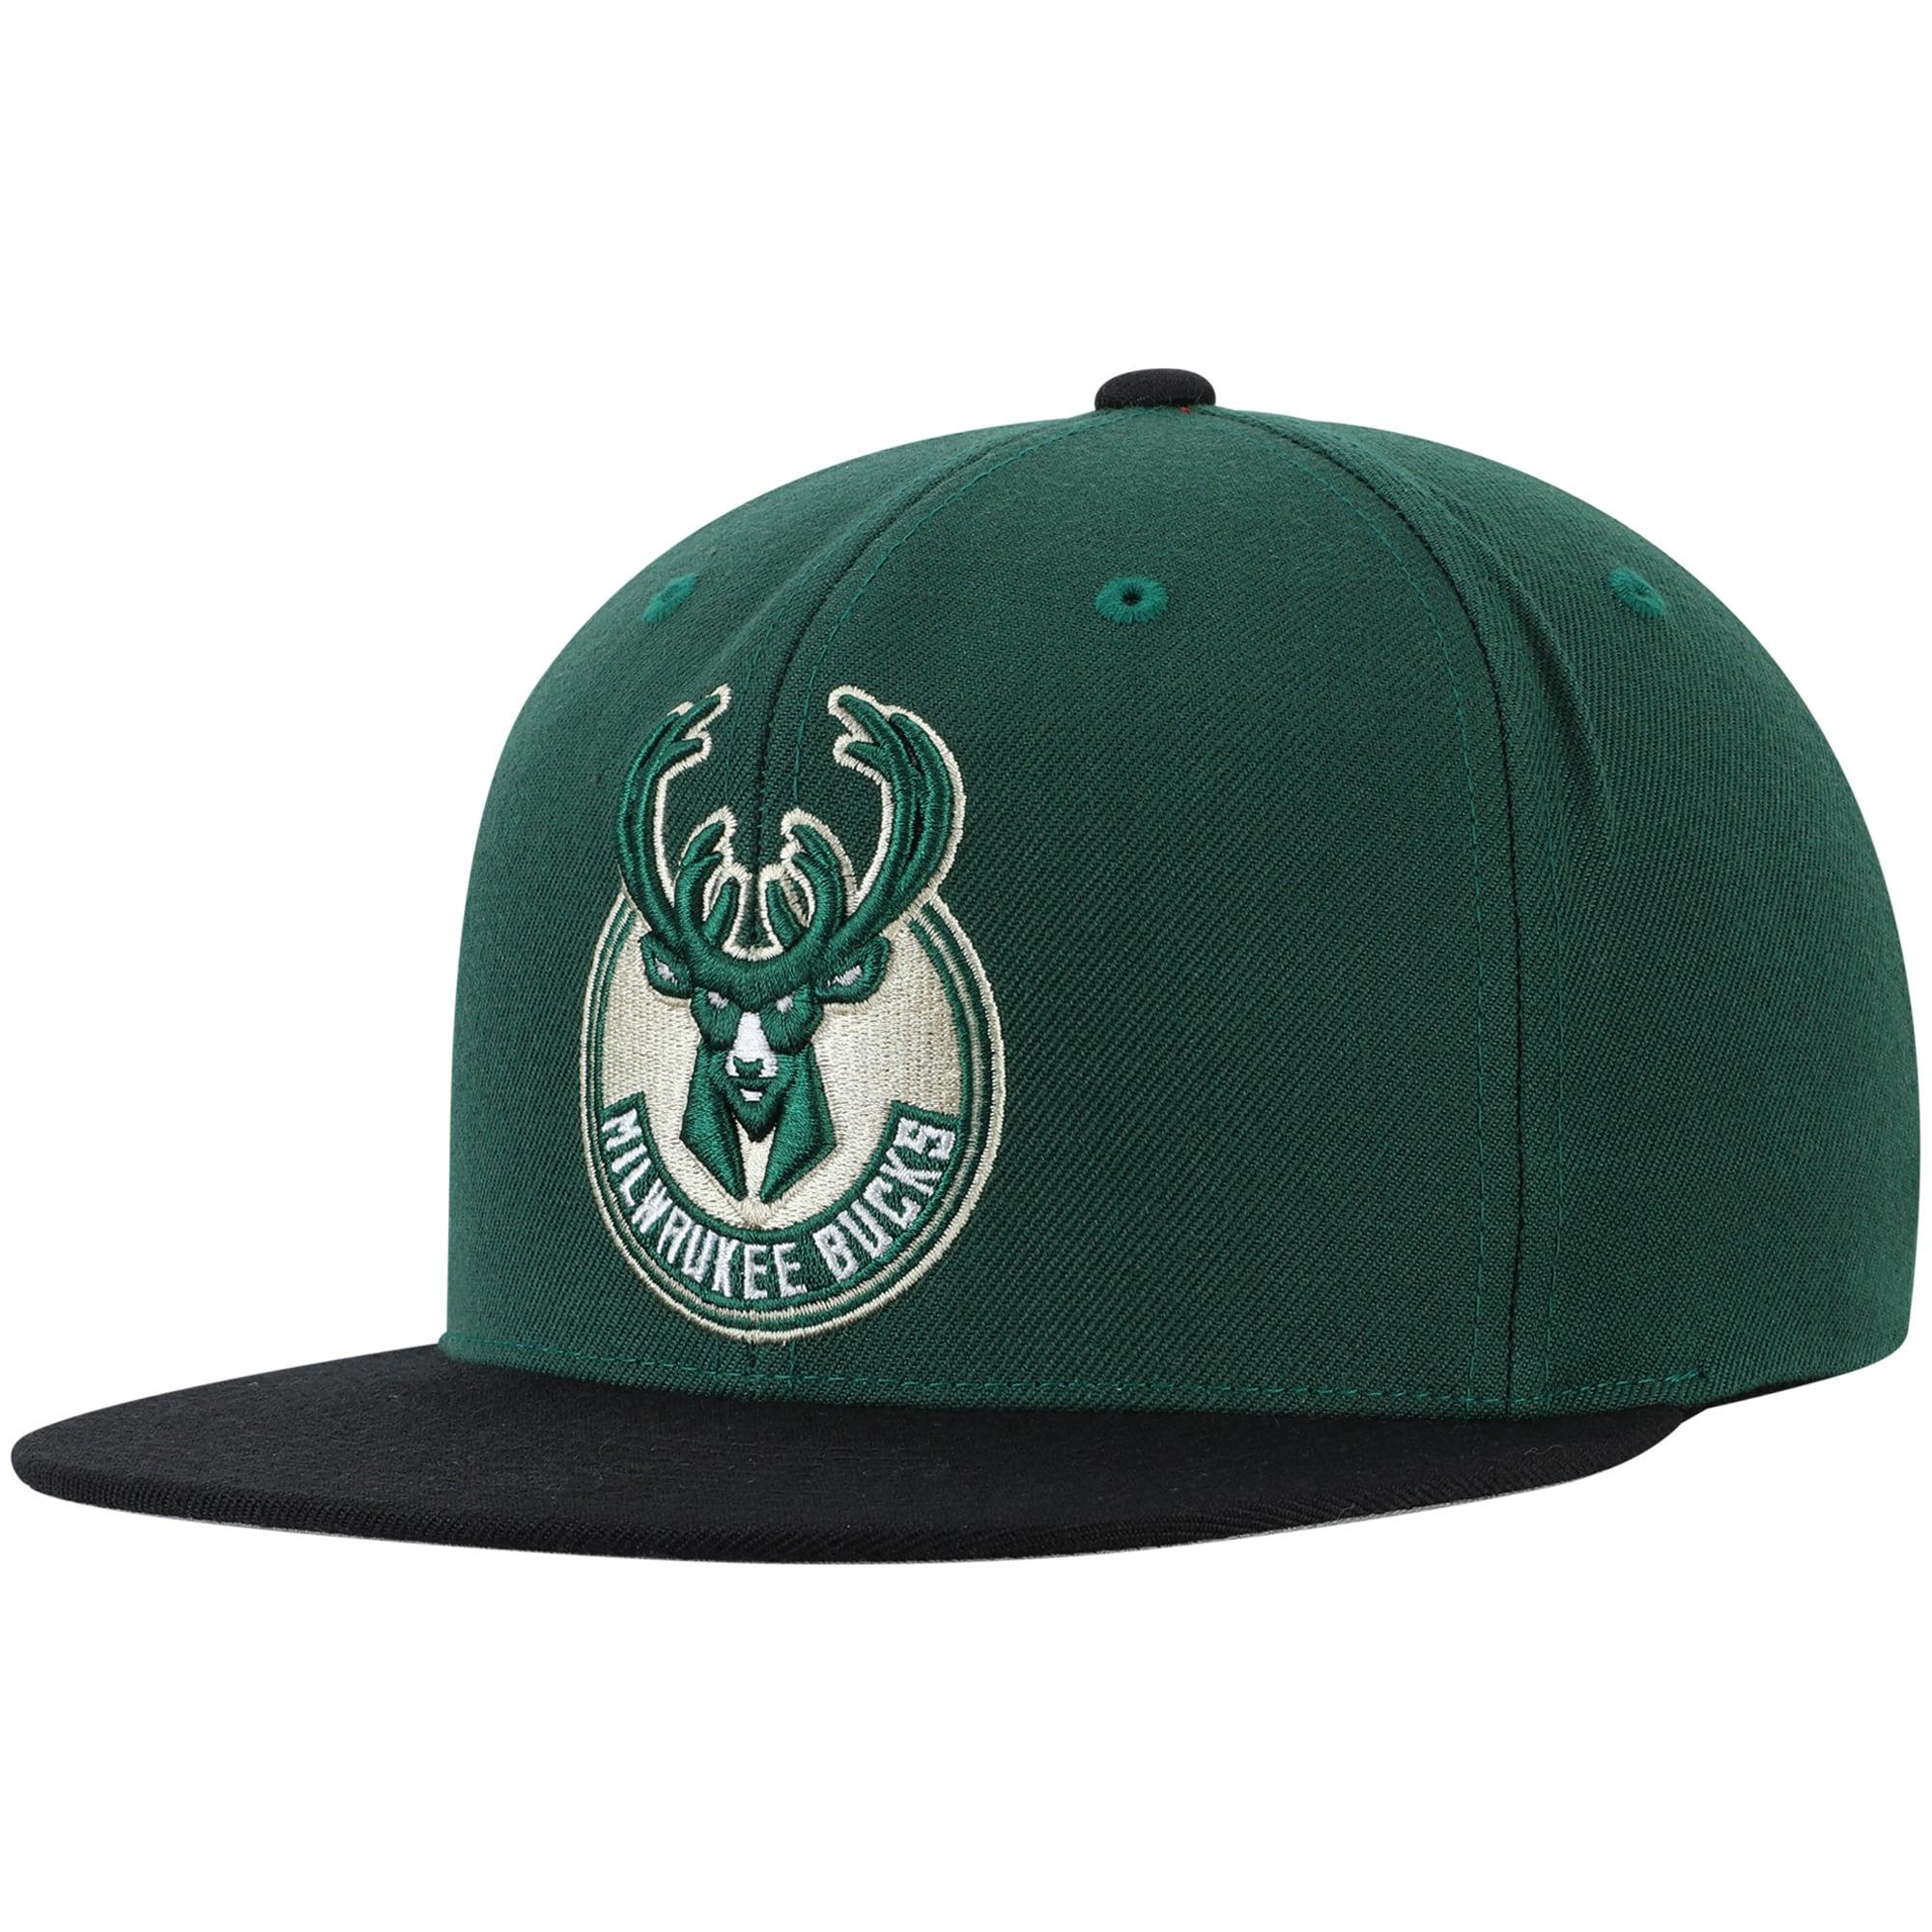 Milwaukee Bucks Mitchell & Ness Two-Tone Wool Snapback Hat - Hunter Green/Black